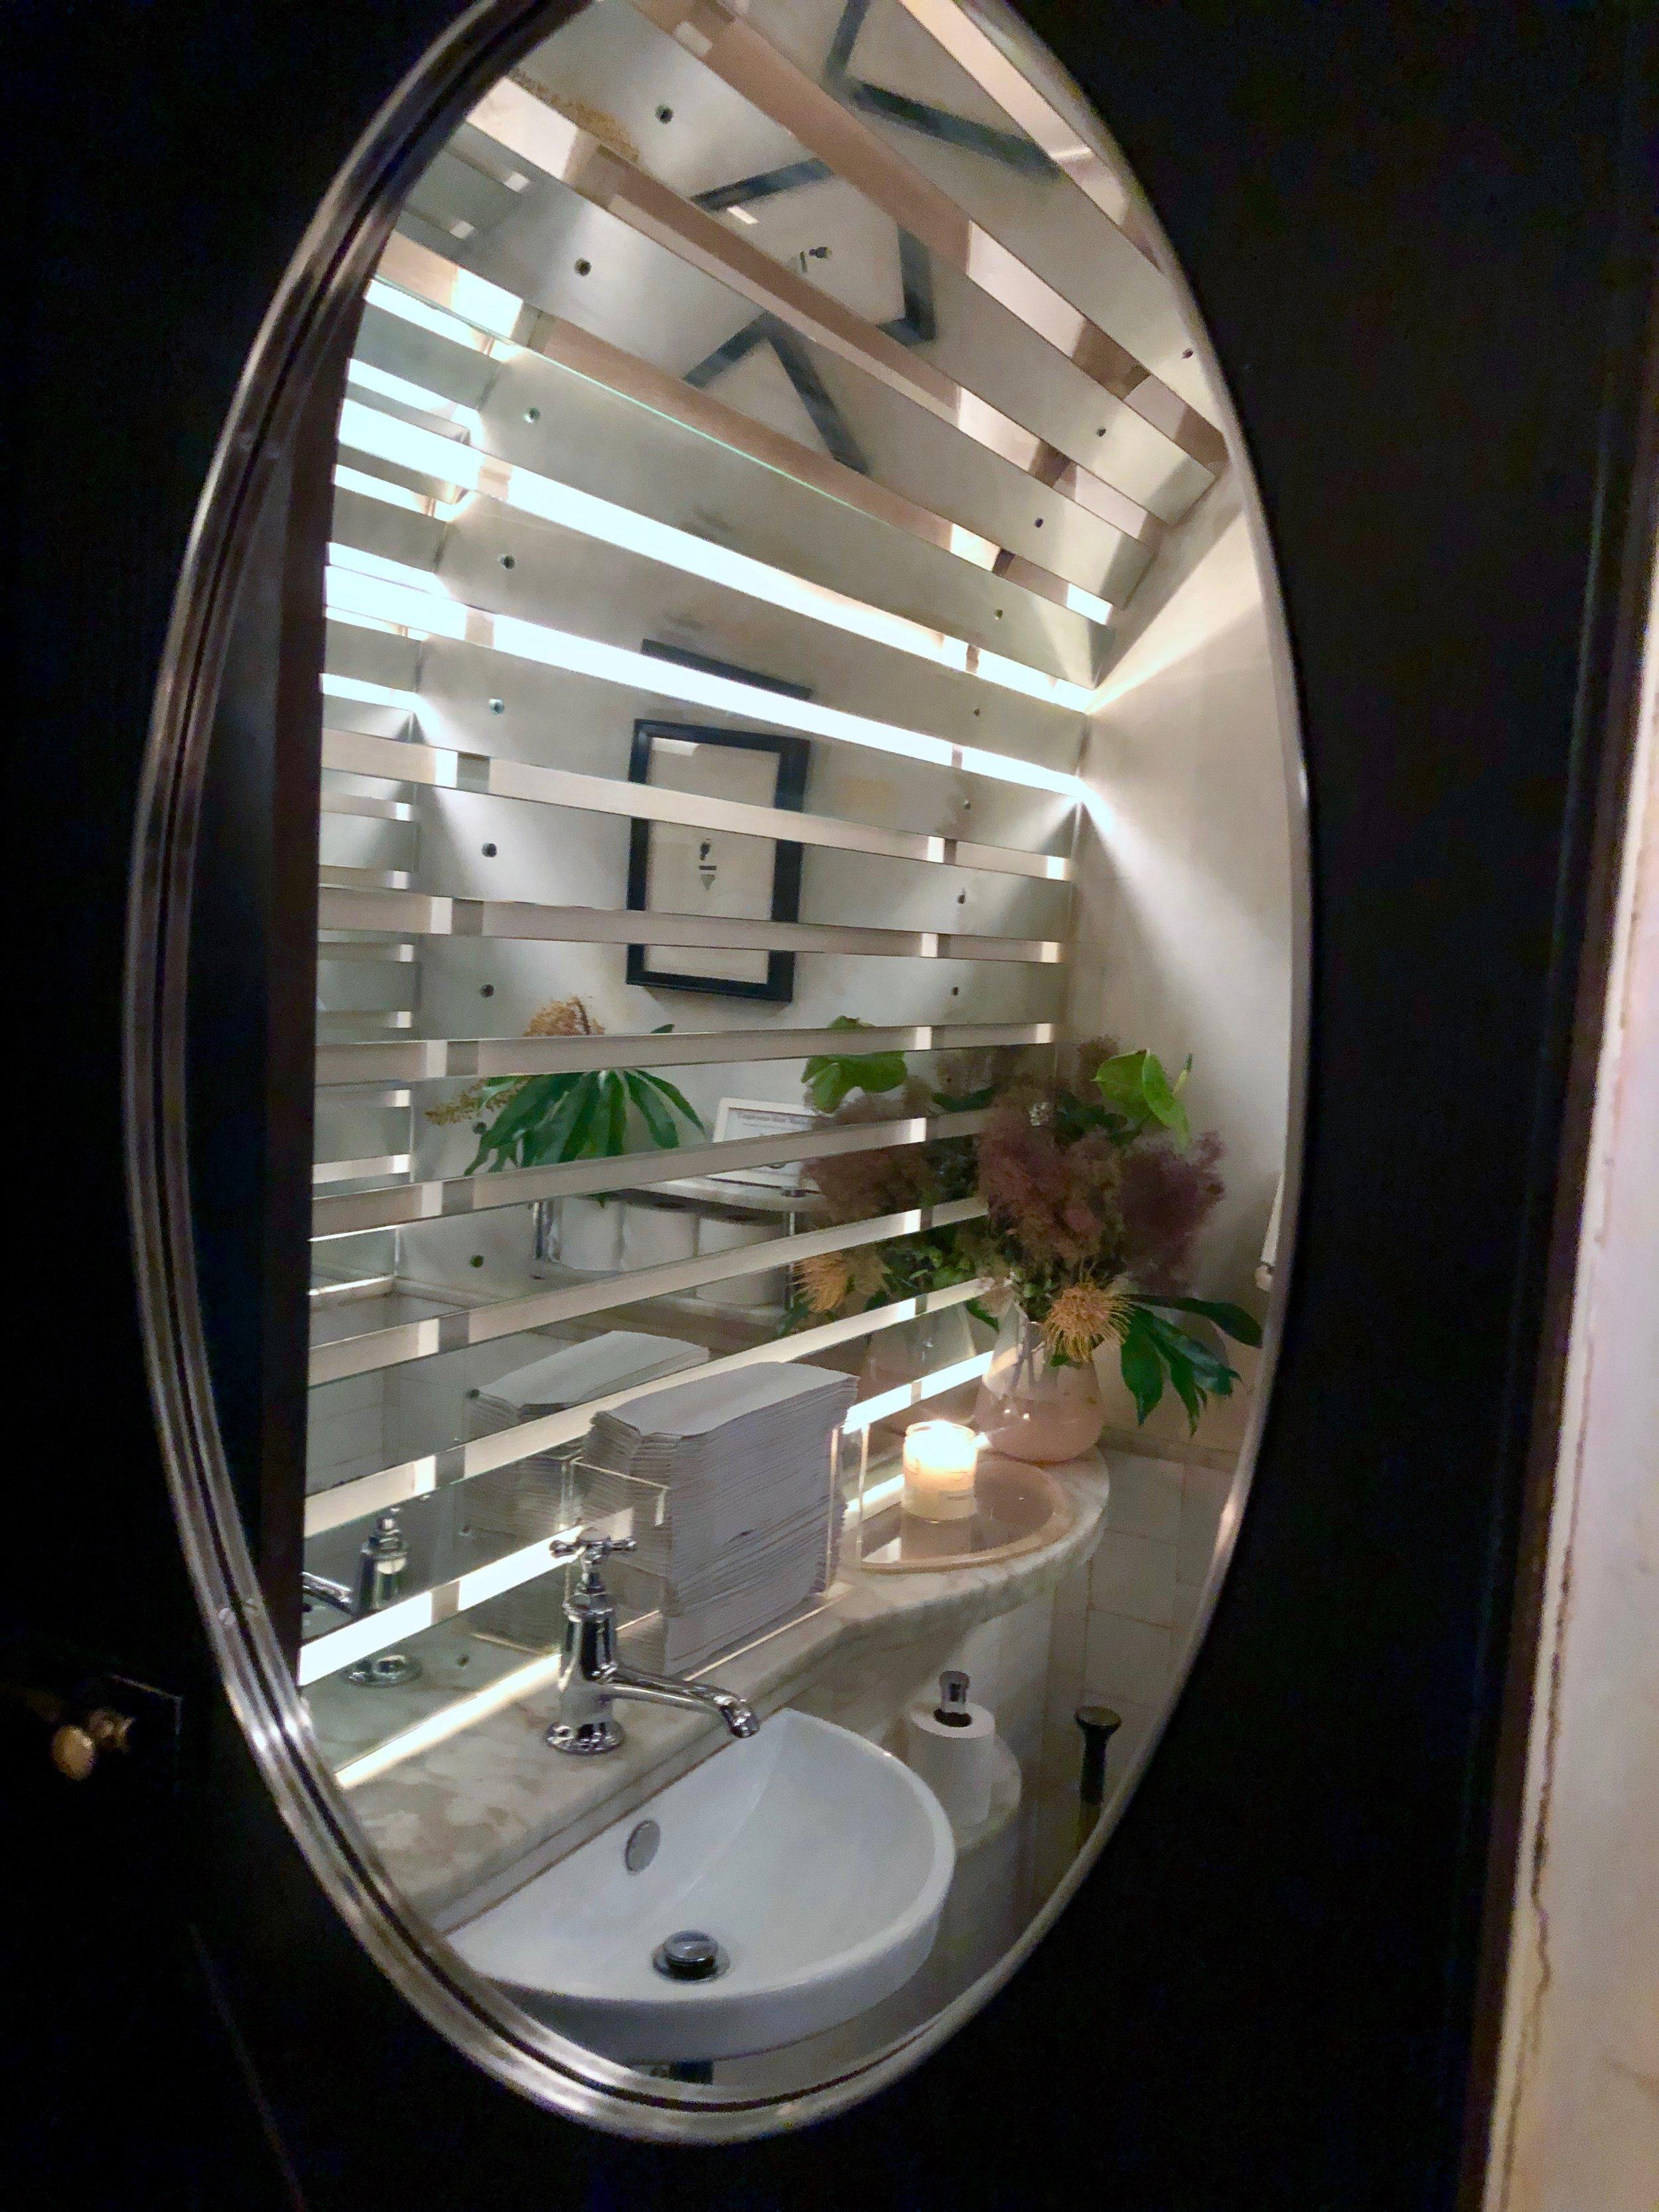 The bathroom at Elsa in downtown Brooklyn - Brooklyn's best bathrooms